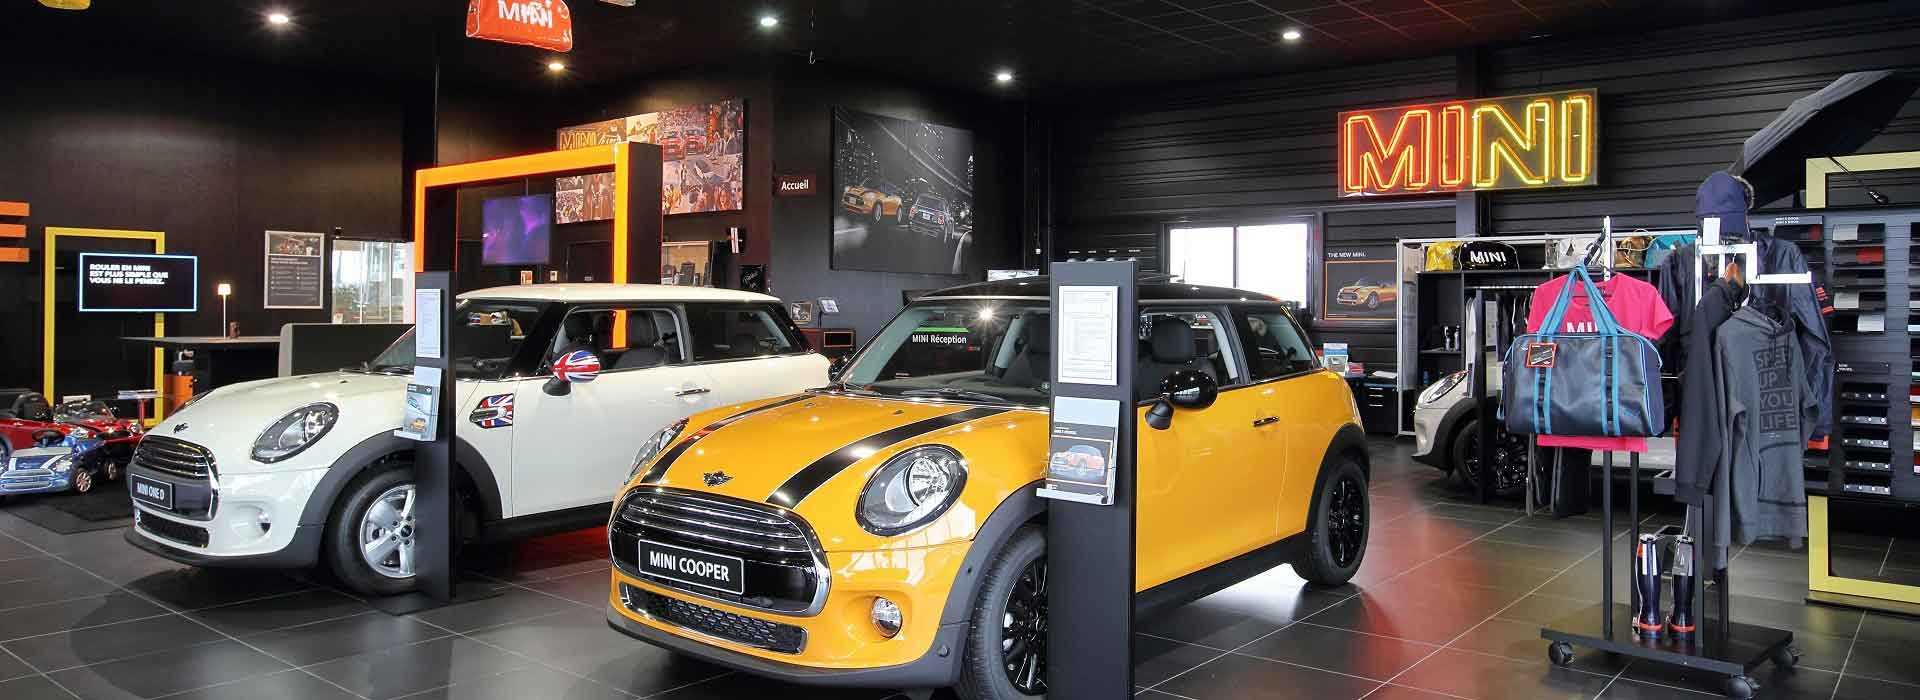 Mini poitiers concessionnaire garage vienne 86 for Garage ranger poitiers horaires